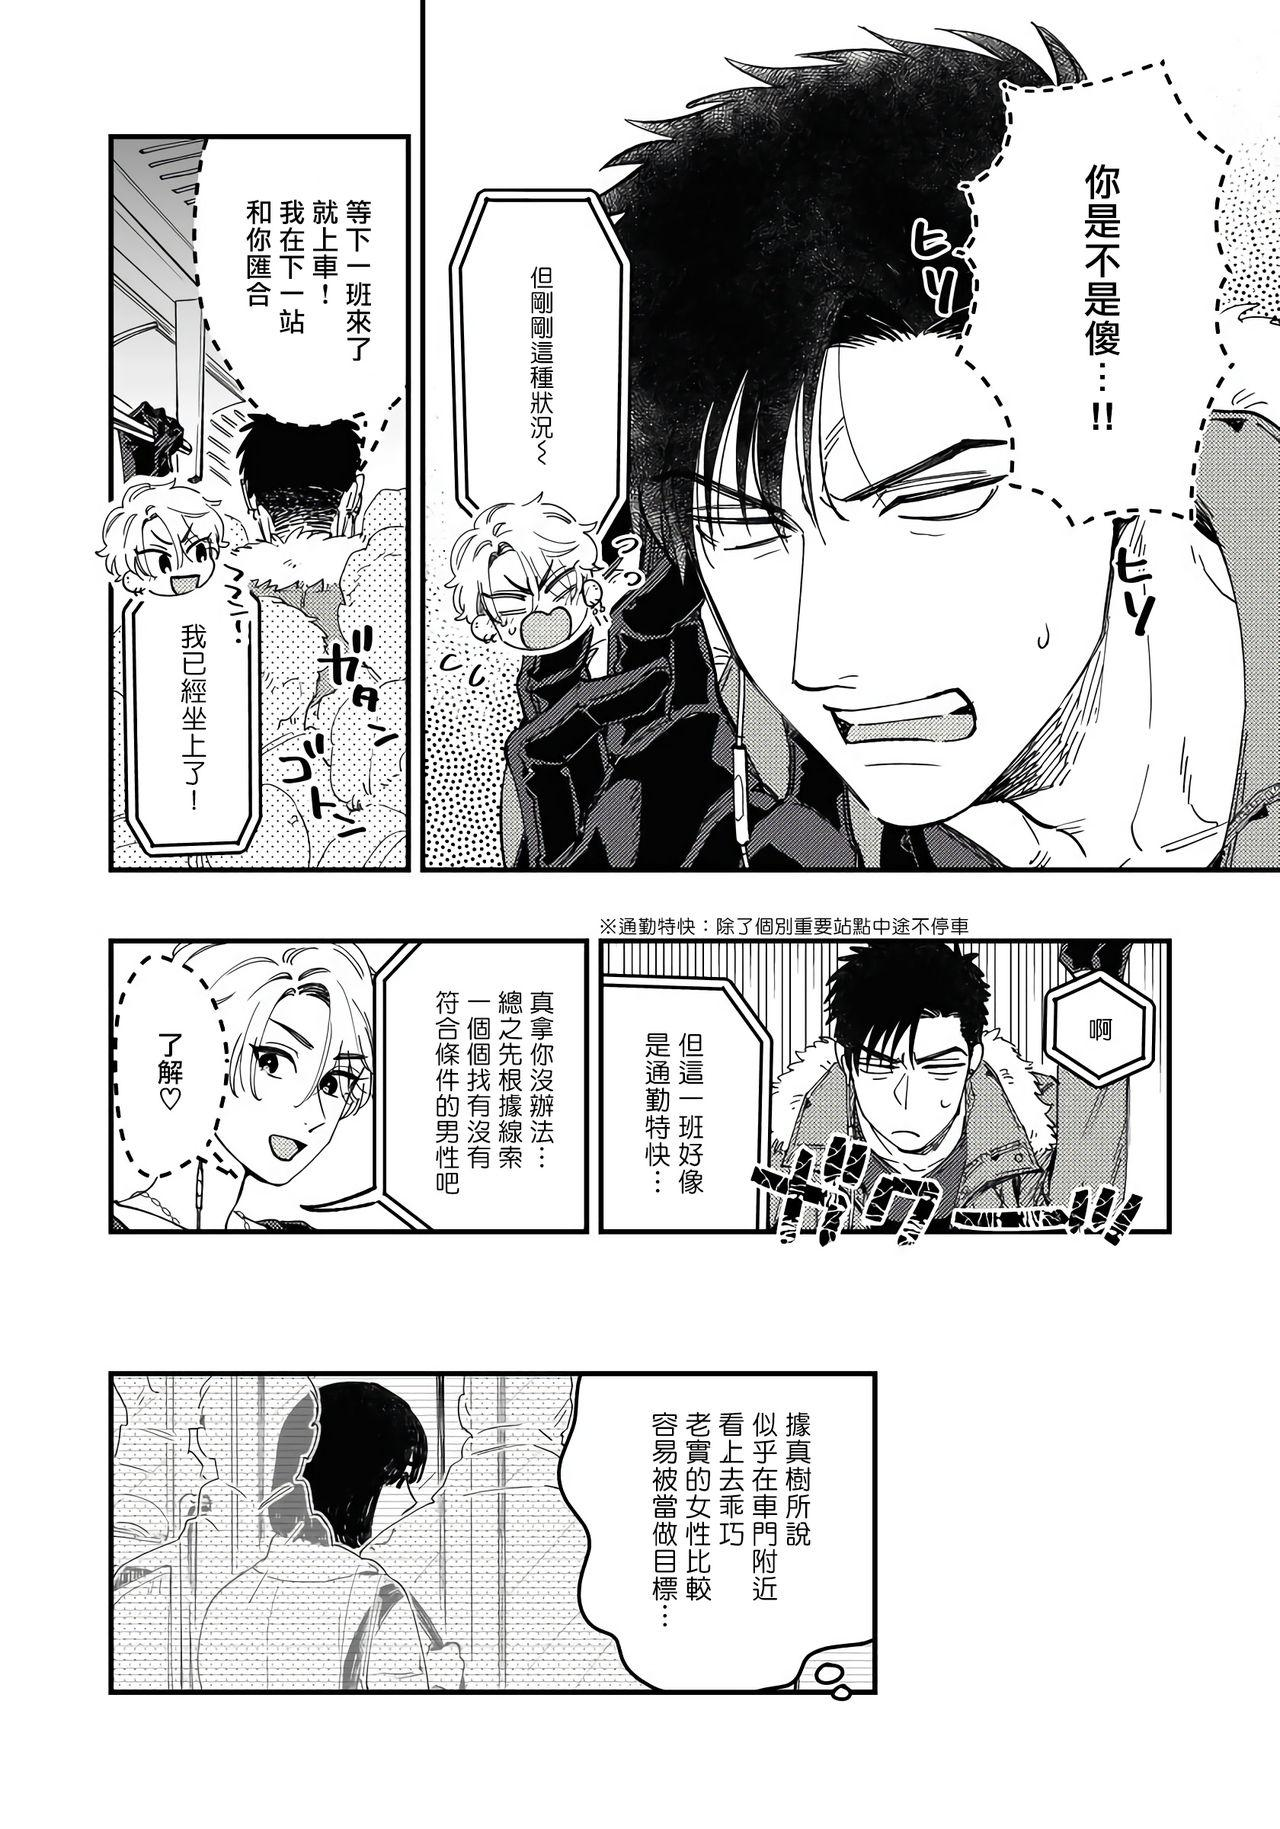 Kokomade Yarutoha Kiitenai! |之前可没听说要做到这个份上啊! 1-3 9